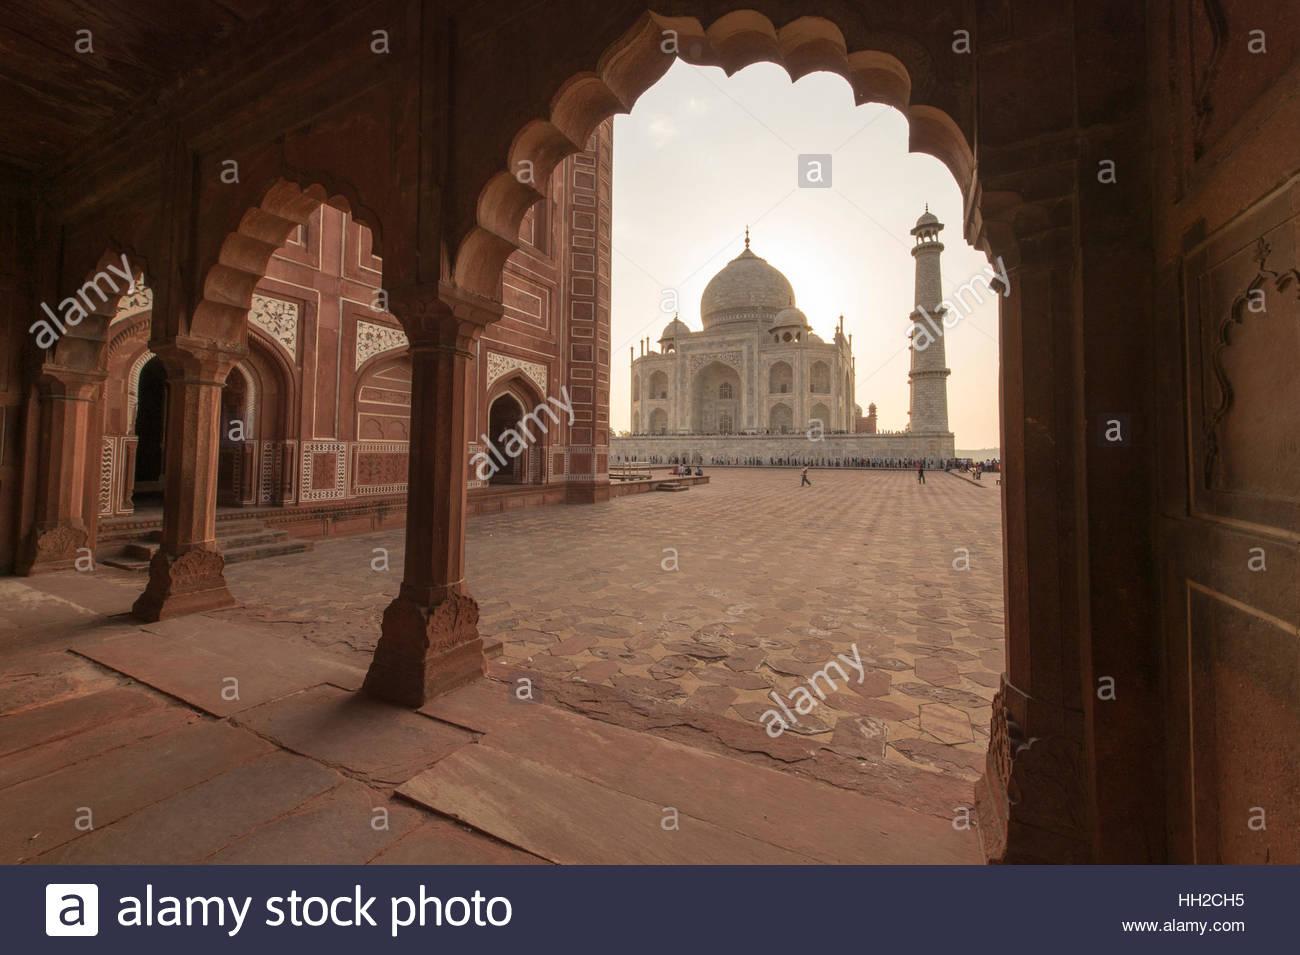 Taj Mahal during sunset. - Stock Image